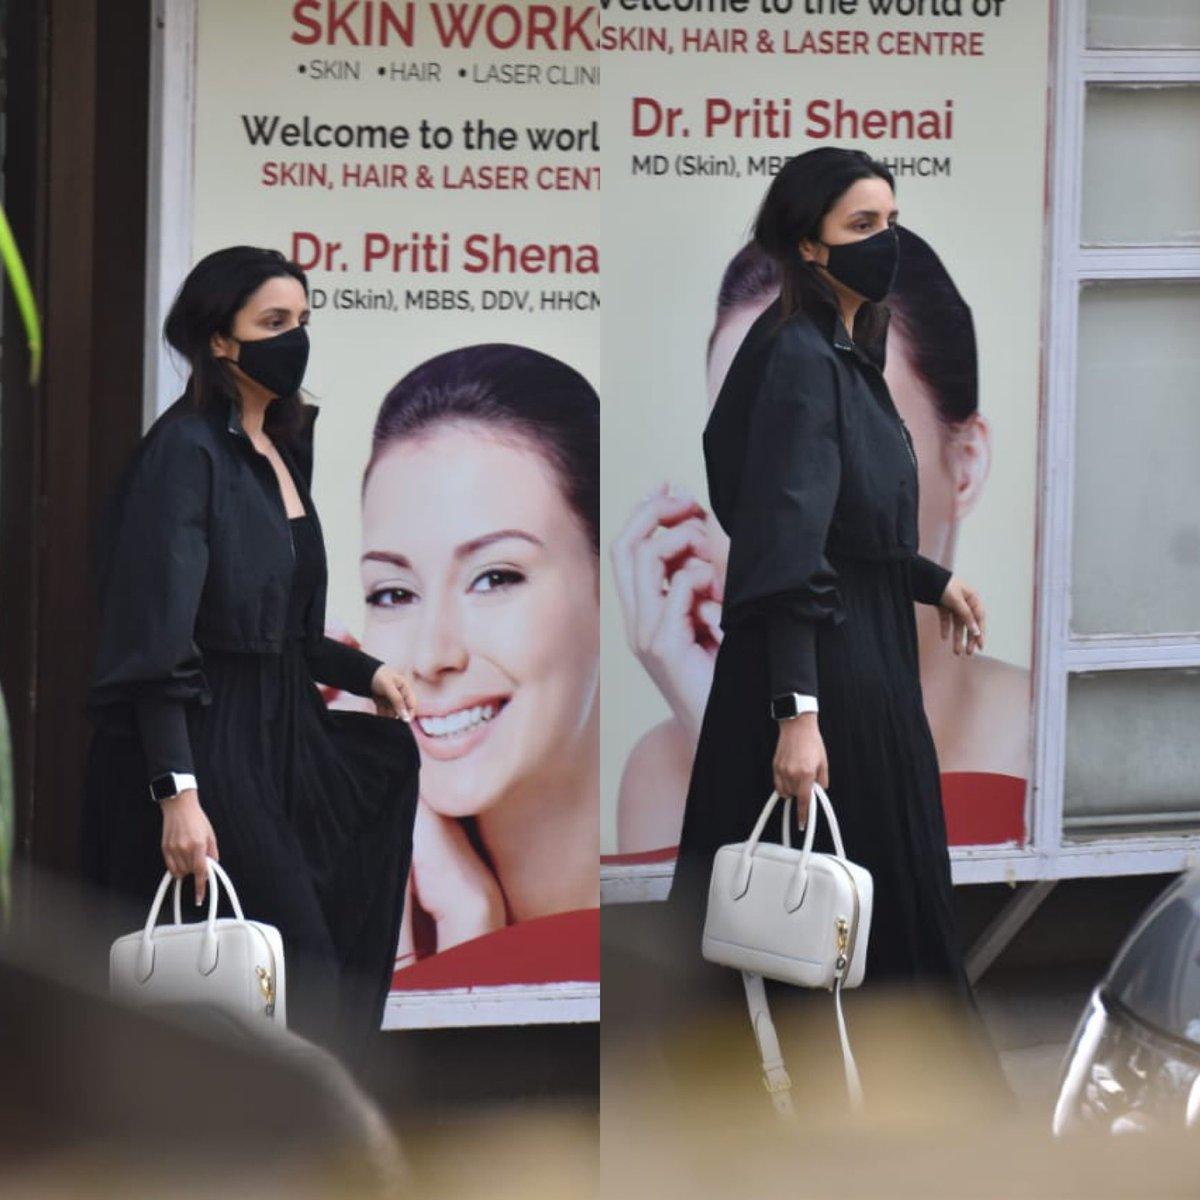 Parineeti Chopra #snapped at  Juhu 😃😃😃 #bollywood #bollywoodactress #bollywoodcelebs #bollywoodstars #celebrity #parineetichopra #beautiful #Instalove #instabollywood #instagood #instadaily